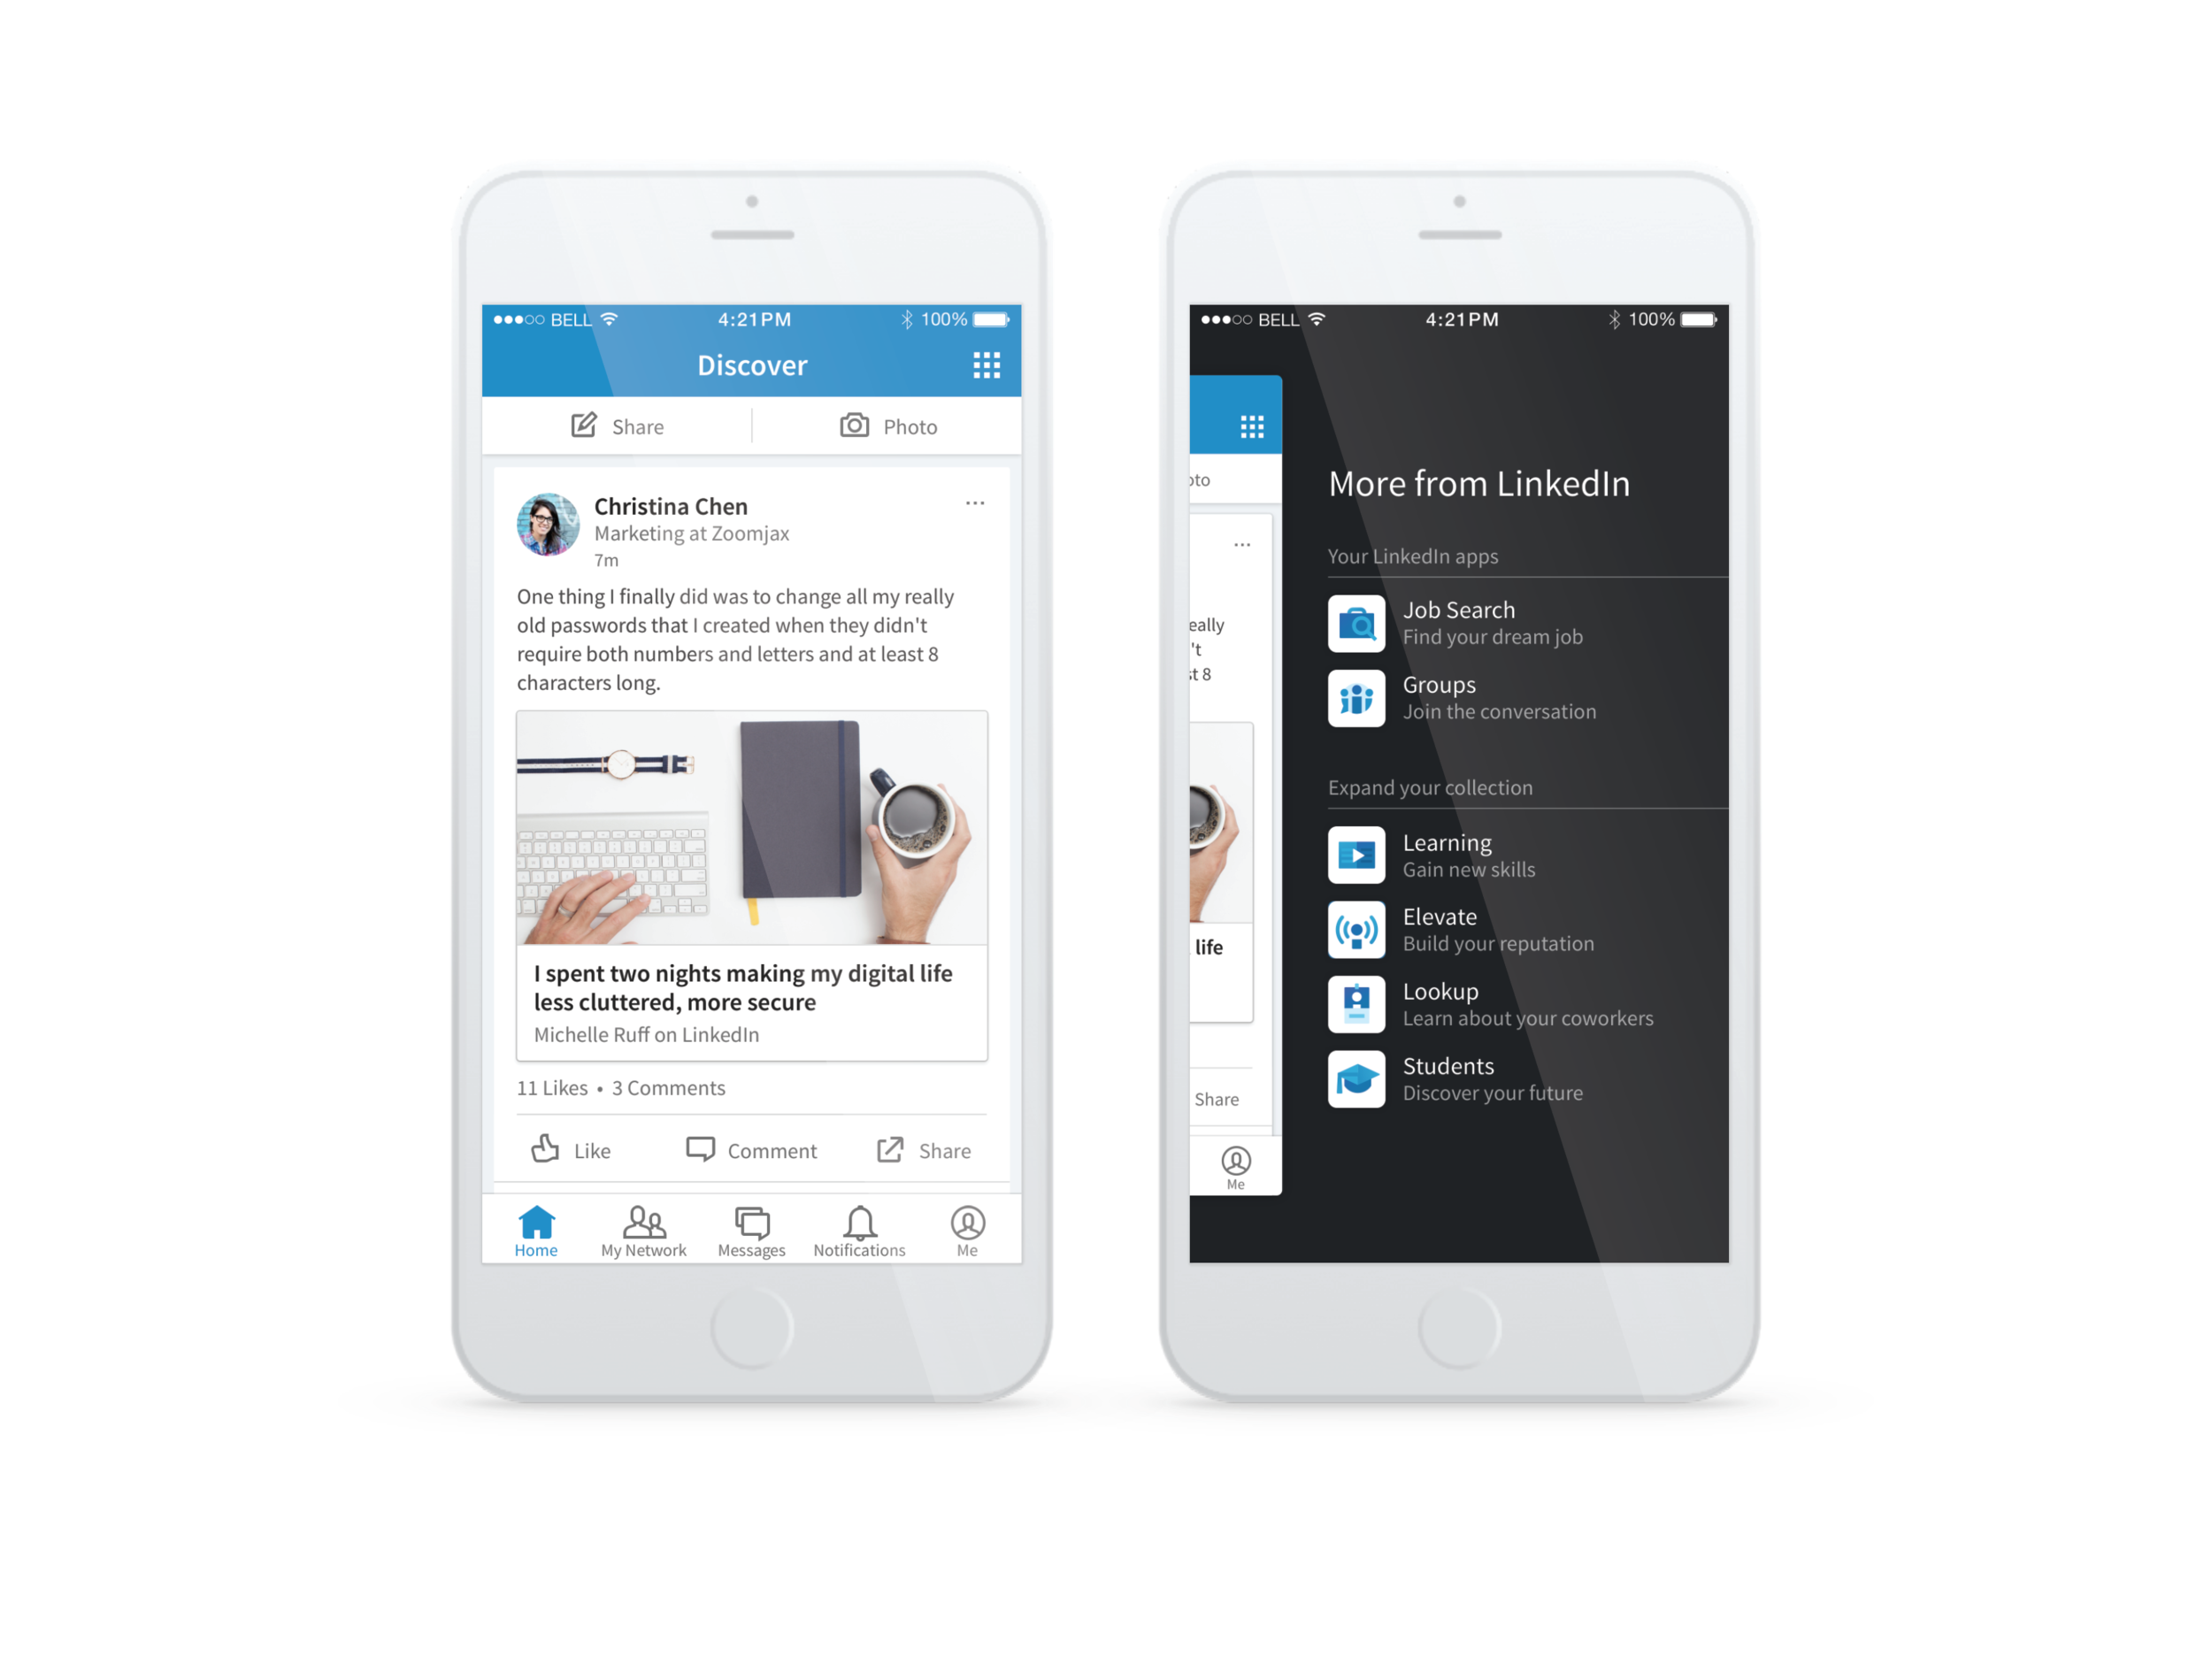 linkedin-mobile-nav.png